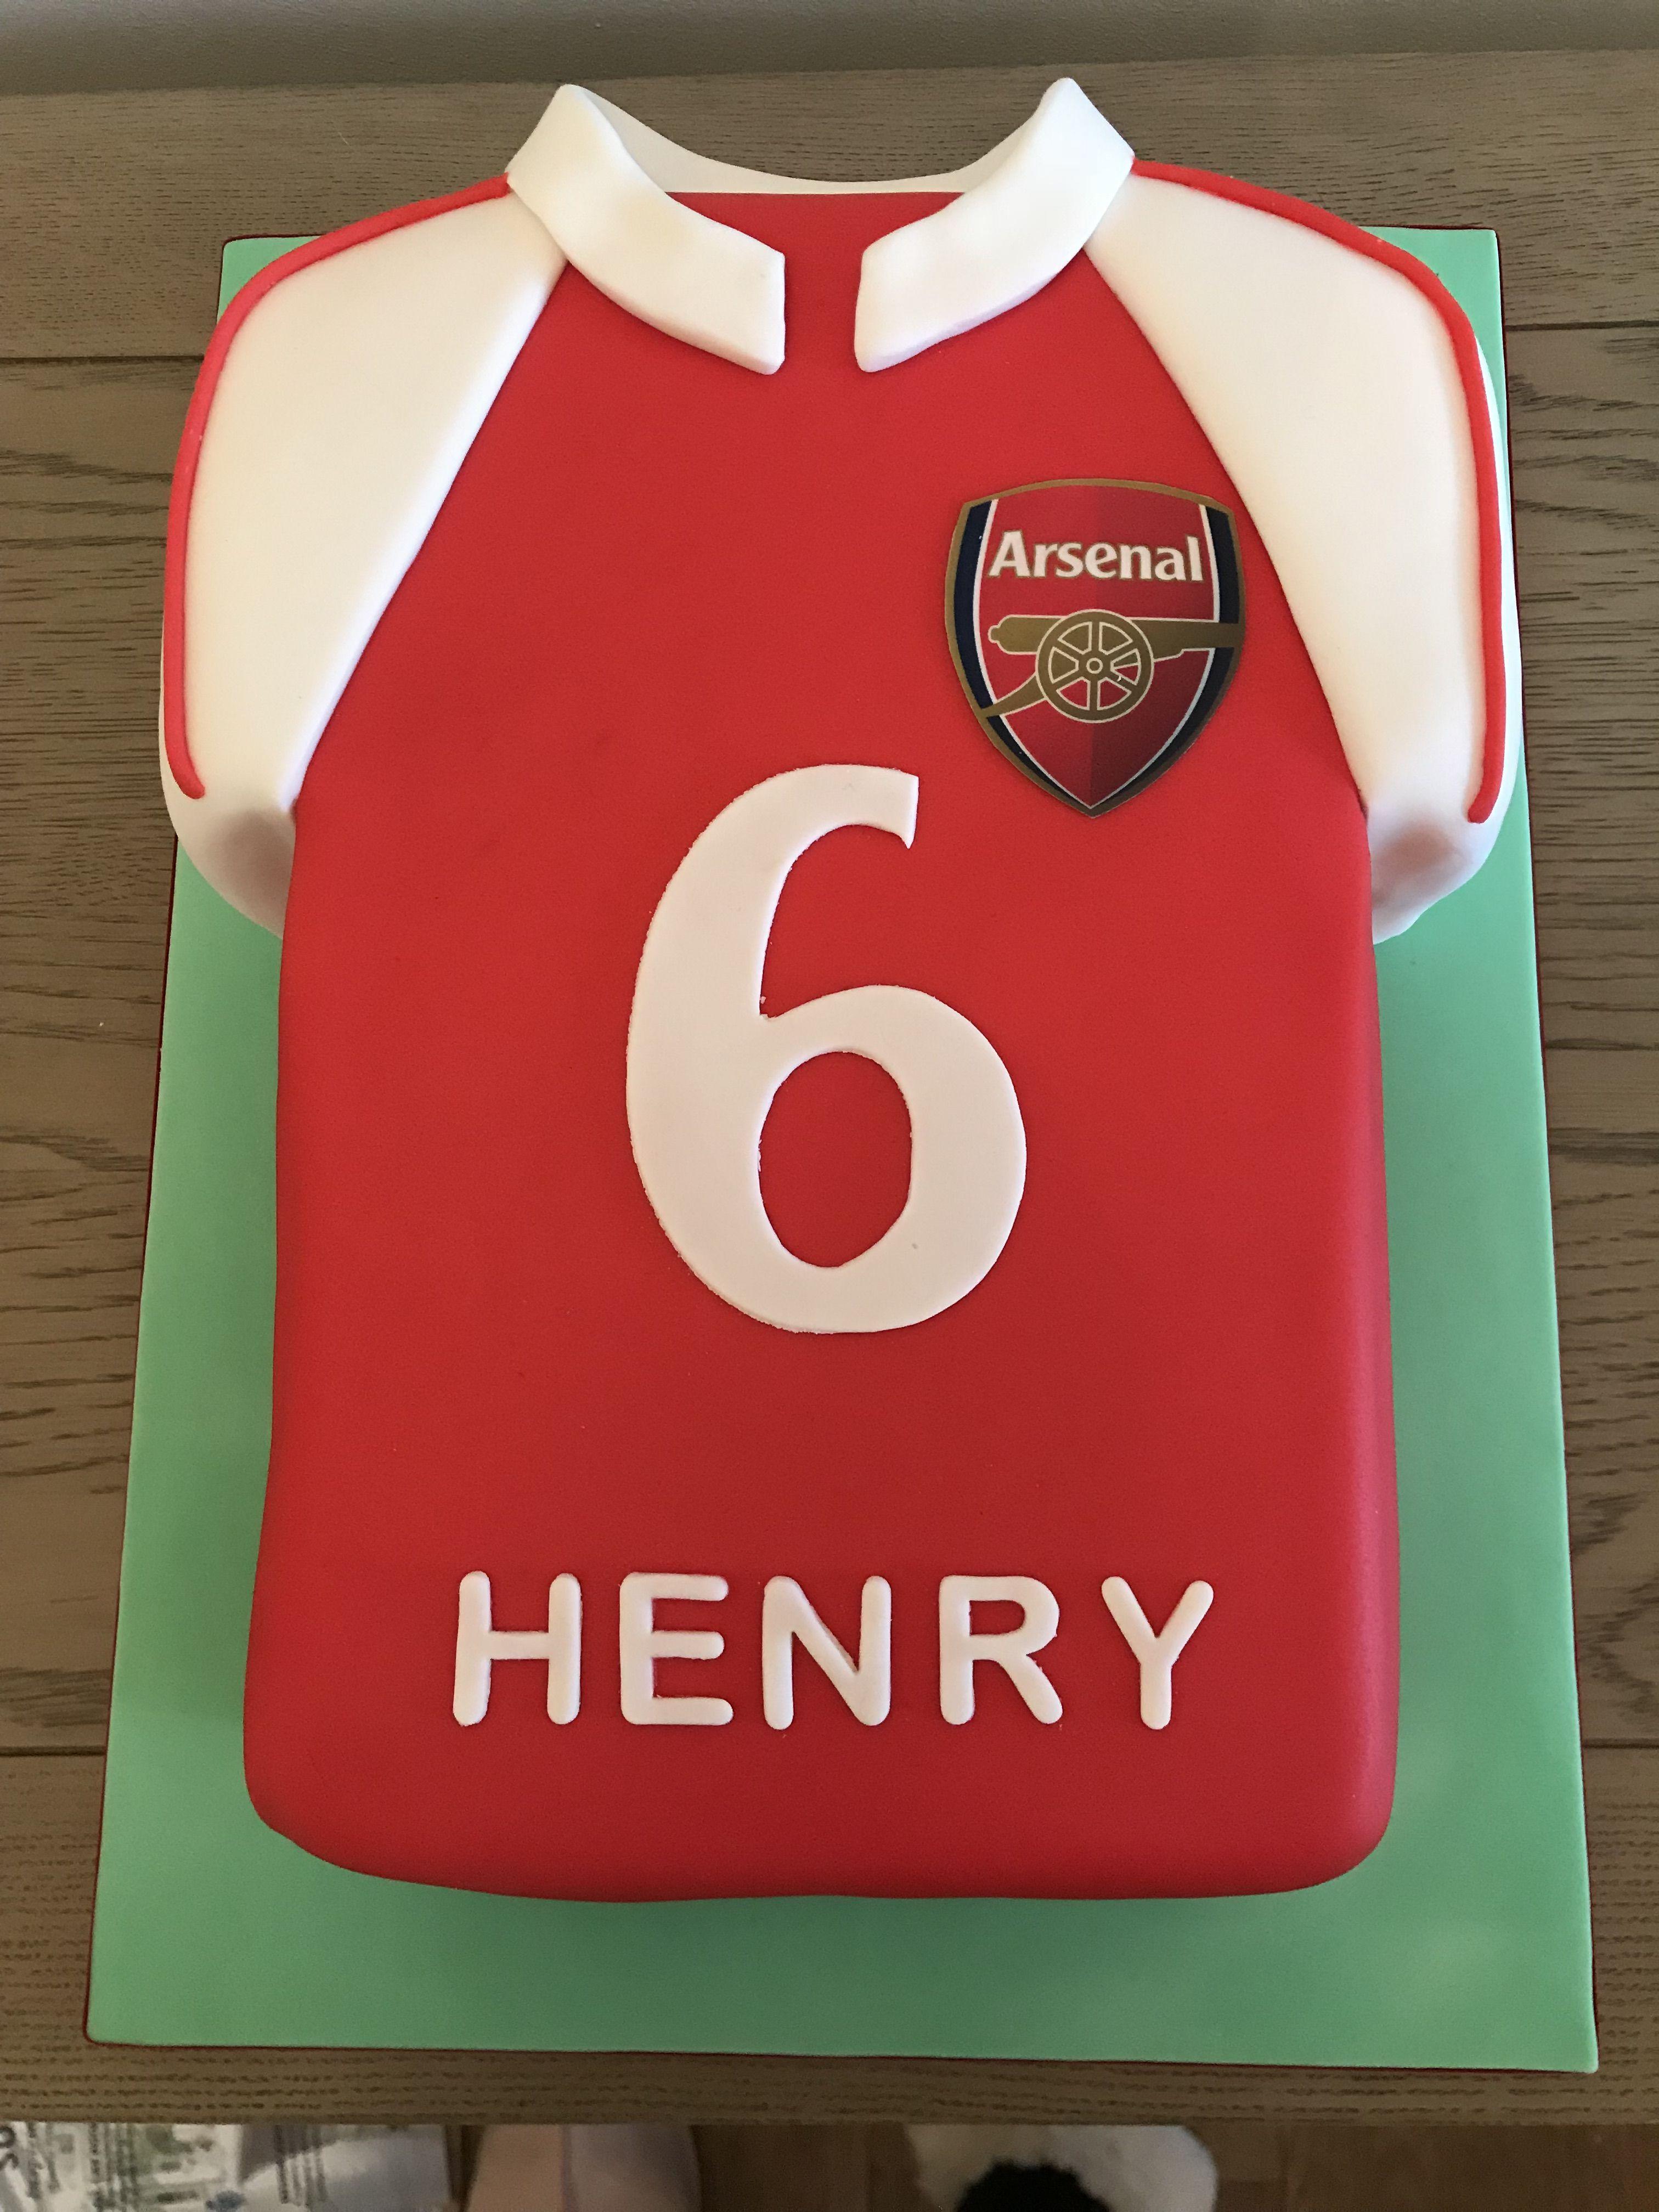 Arsenal Football Shirt Cake With Images Shirt Cake Cake